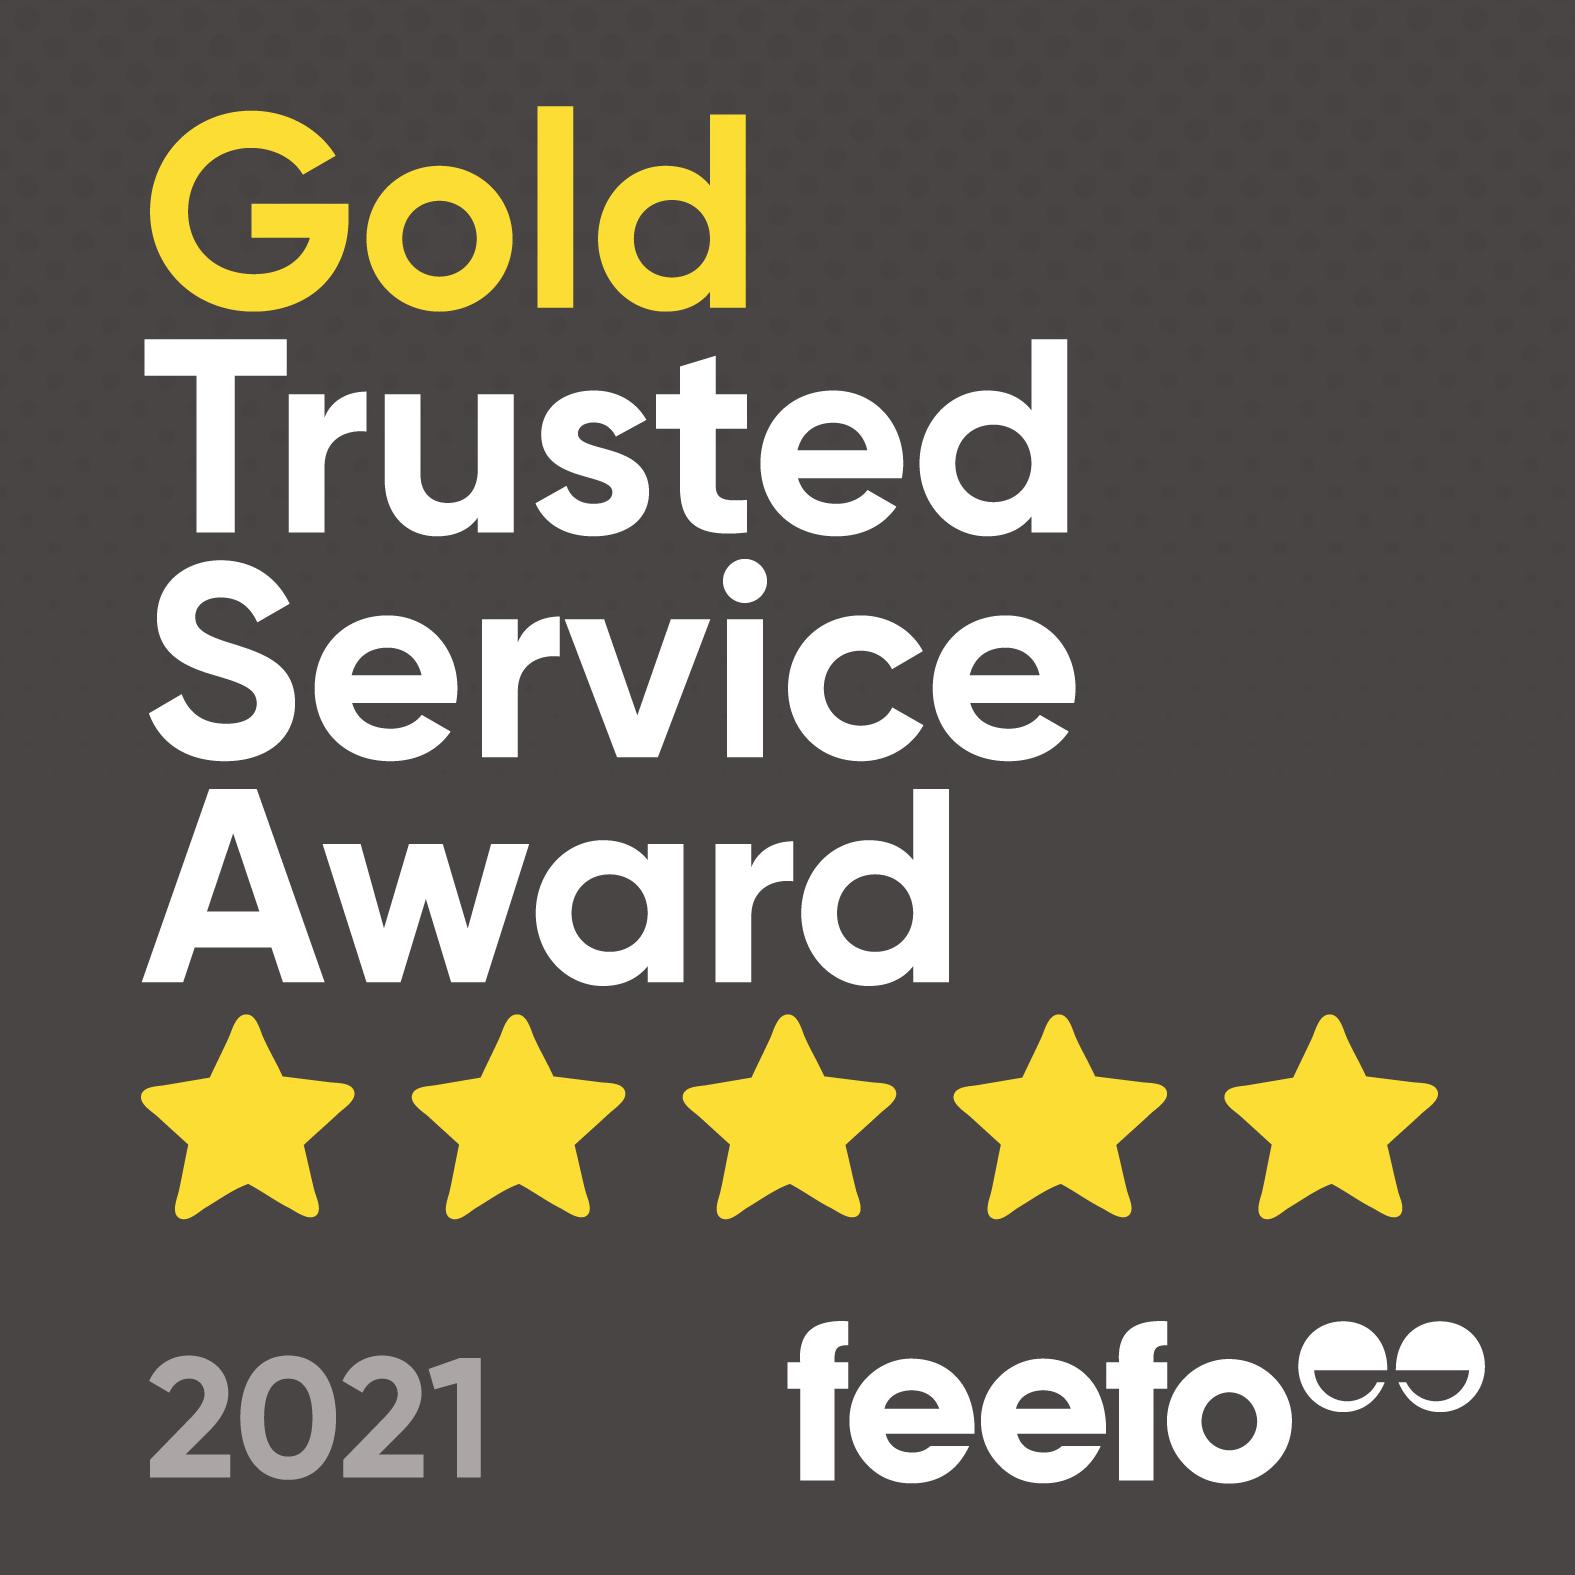 Feefo Gold Trusted Service Award